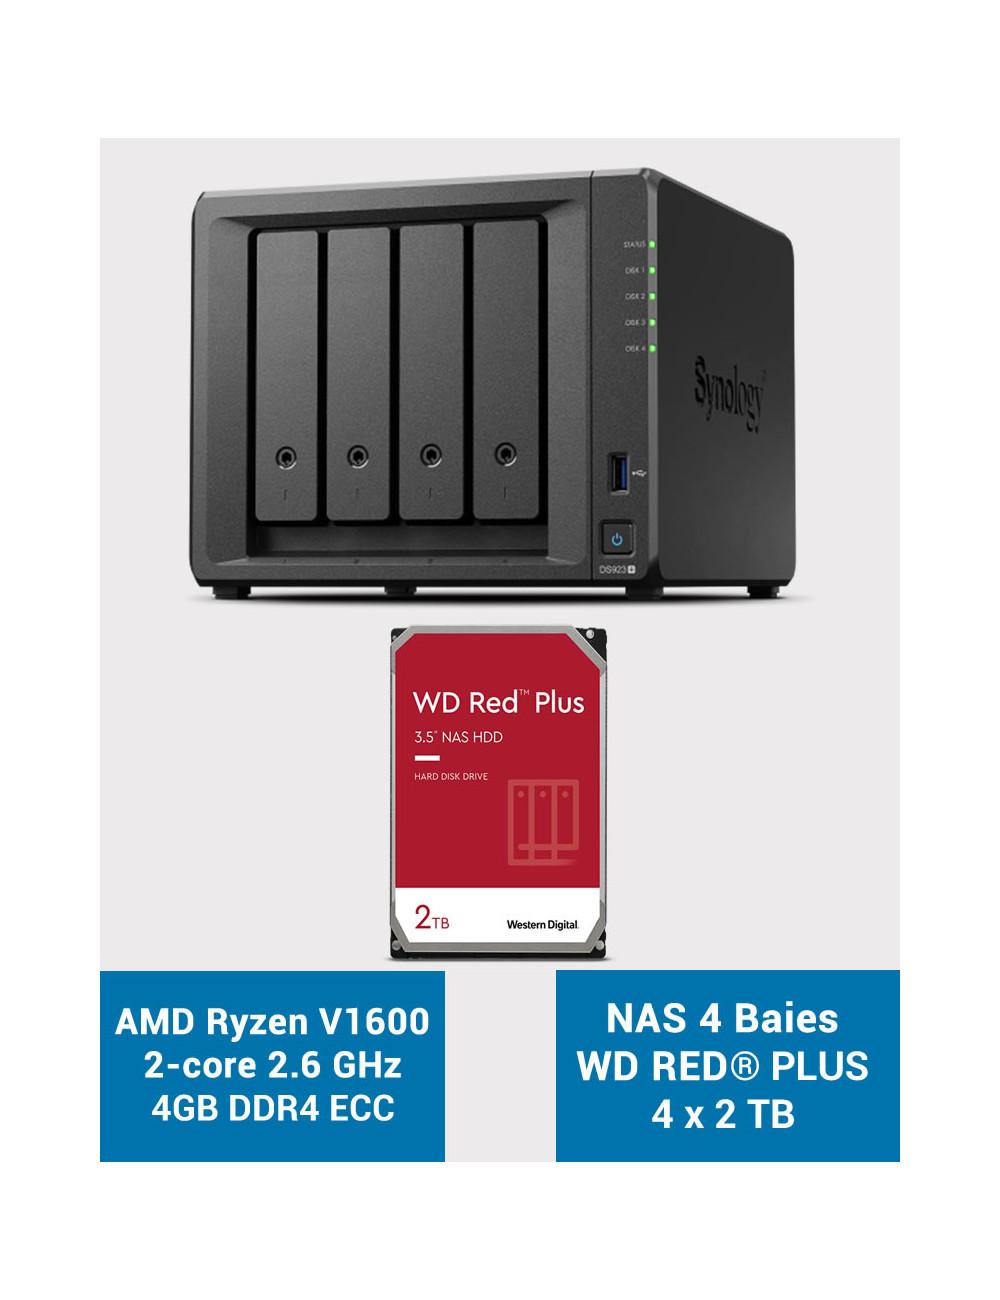 Express Maintenance NBD - 2 years - Firewall AP332WG/AP334WG